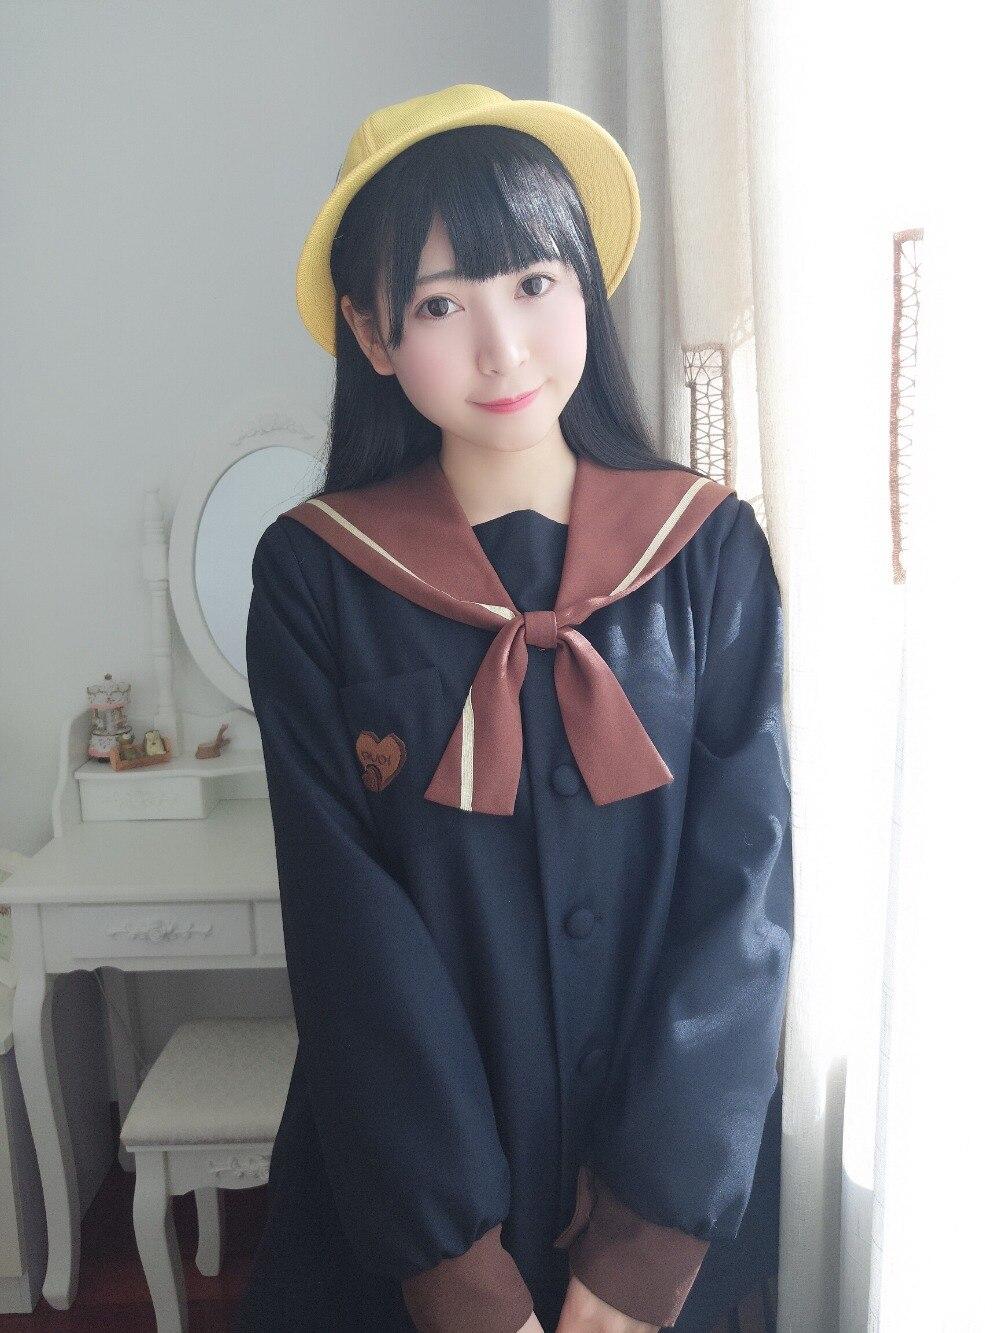 2019 autumn new female students campus high quality school uniform Japanese long sleeve sweet style chocolate color JK uniform